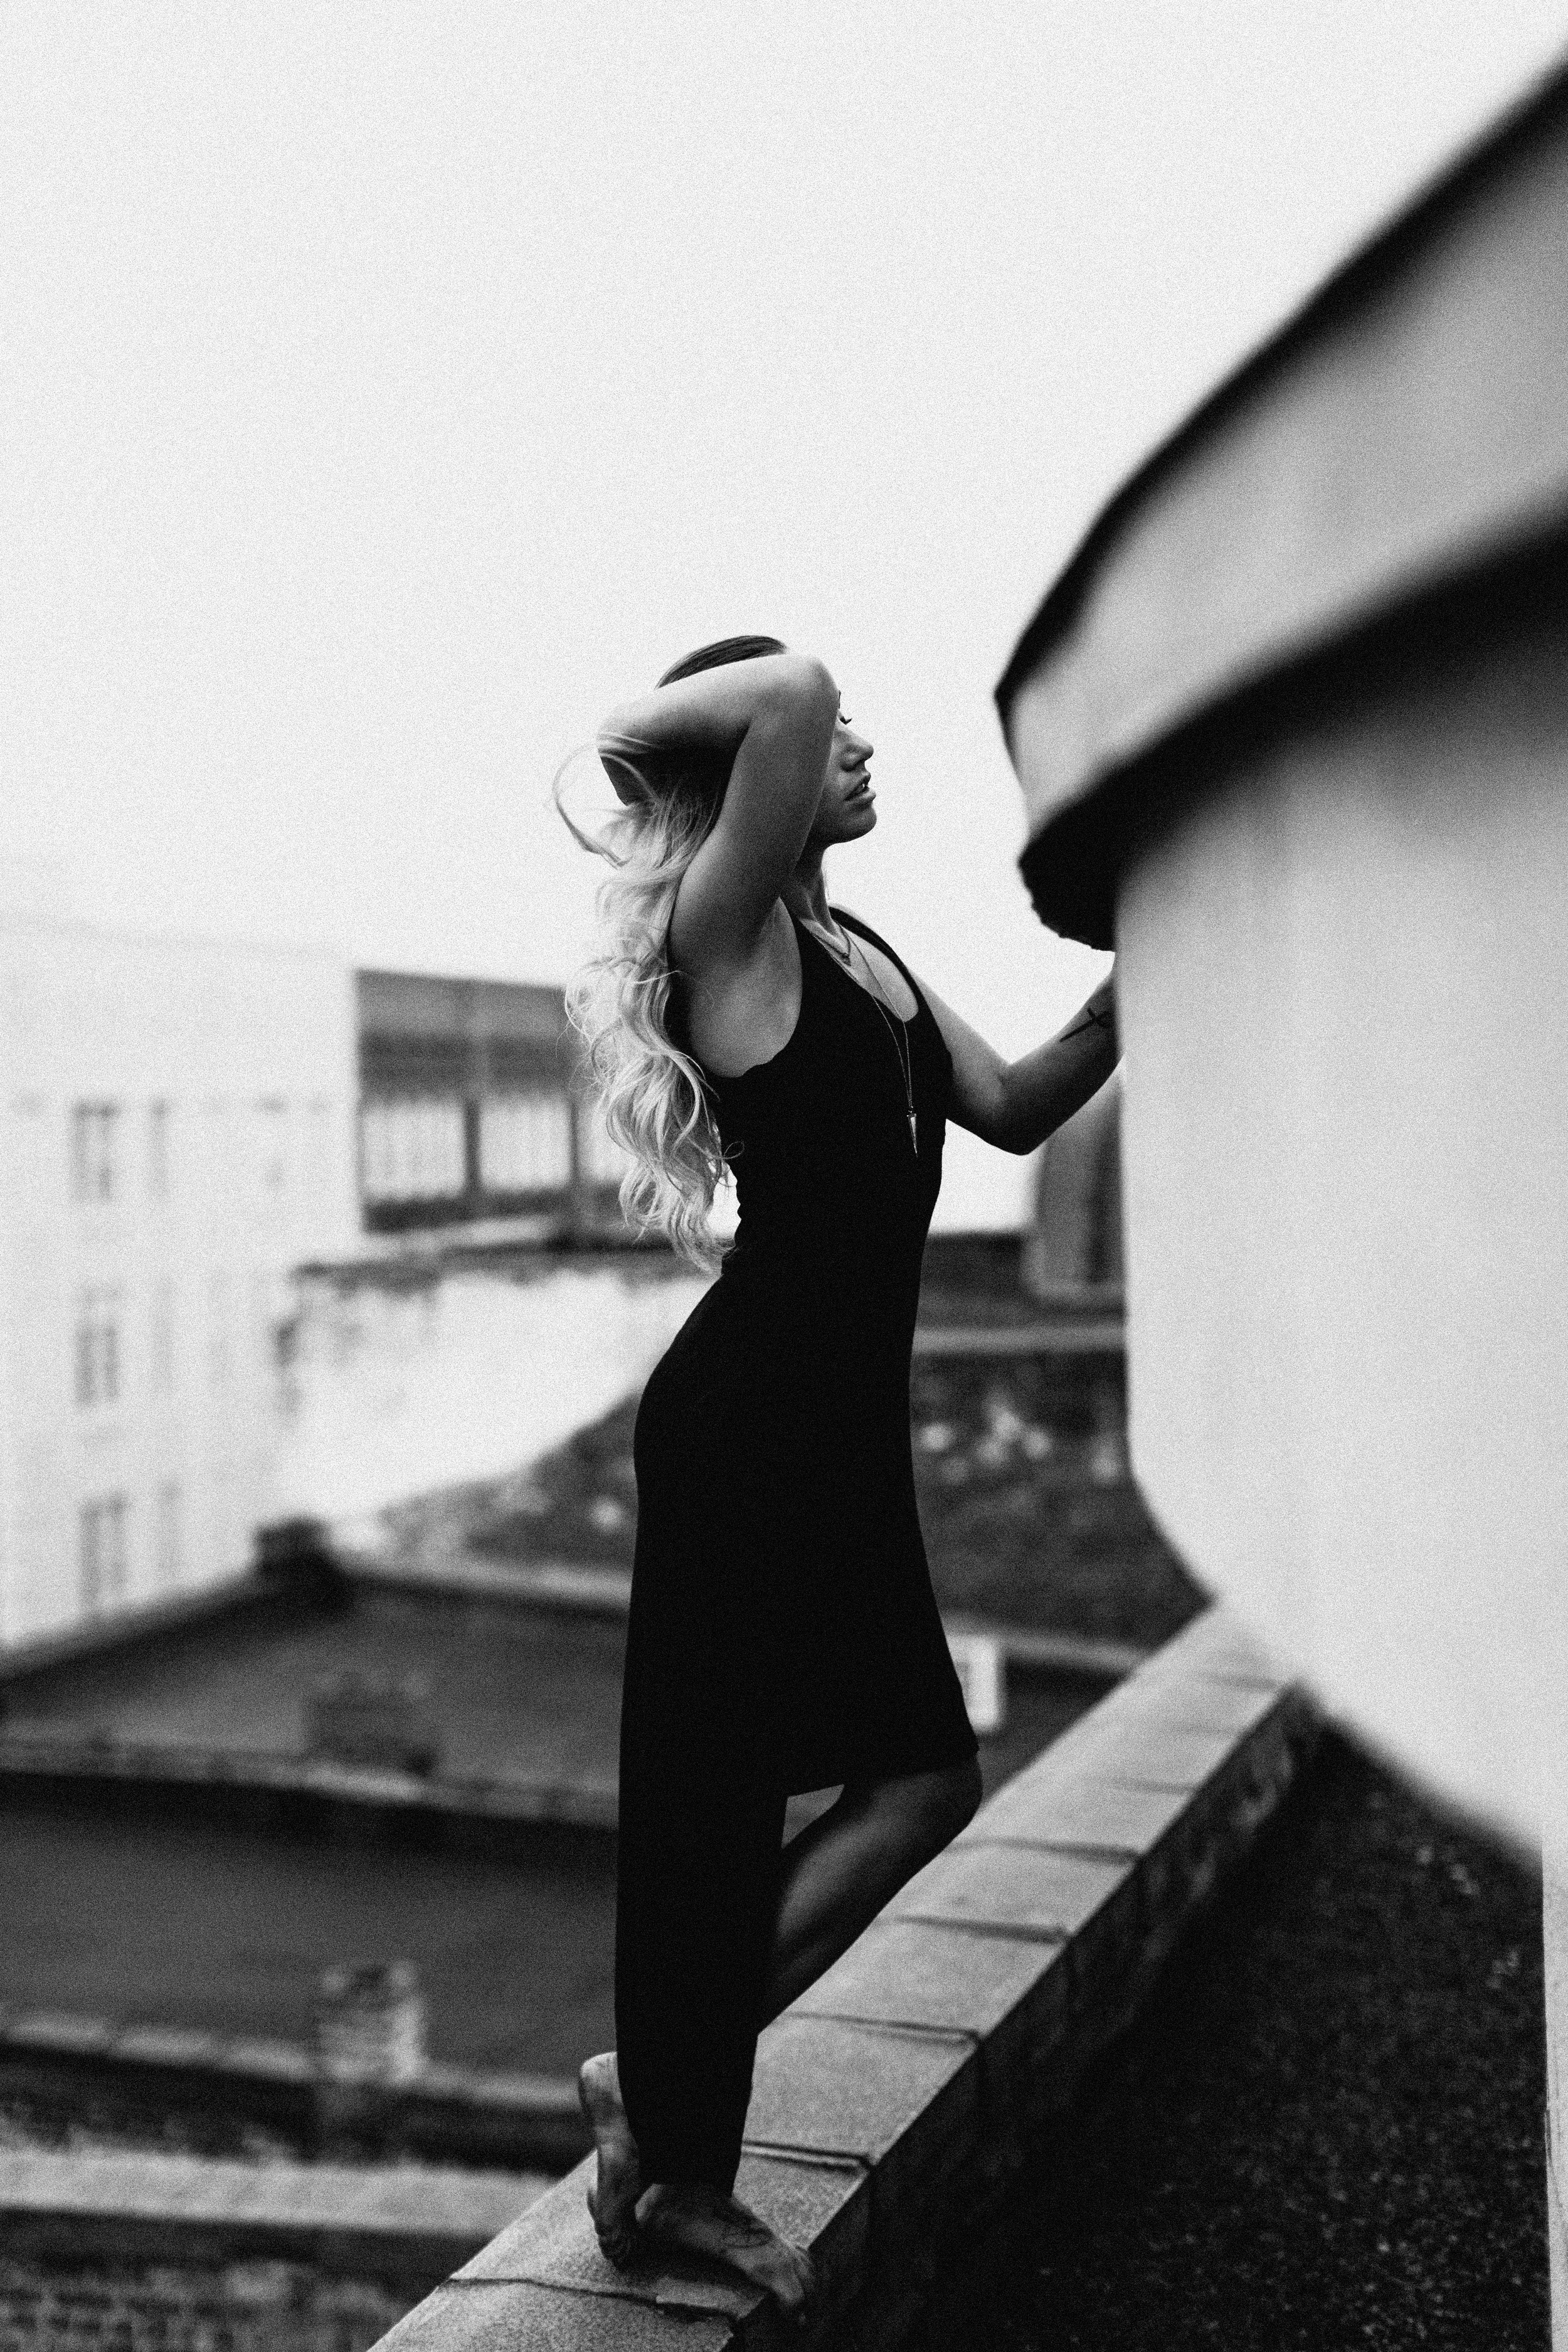 Christina_Fashion-29.jpg